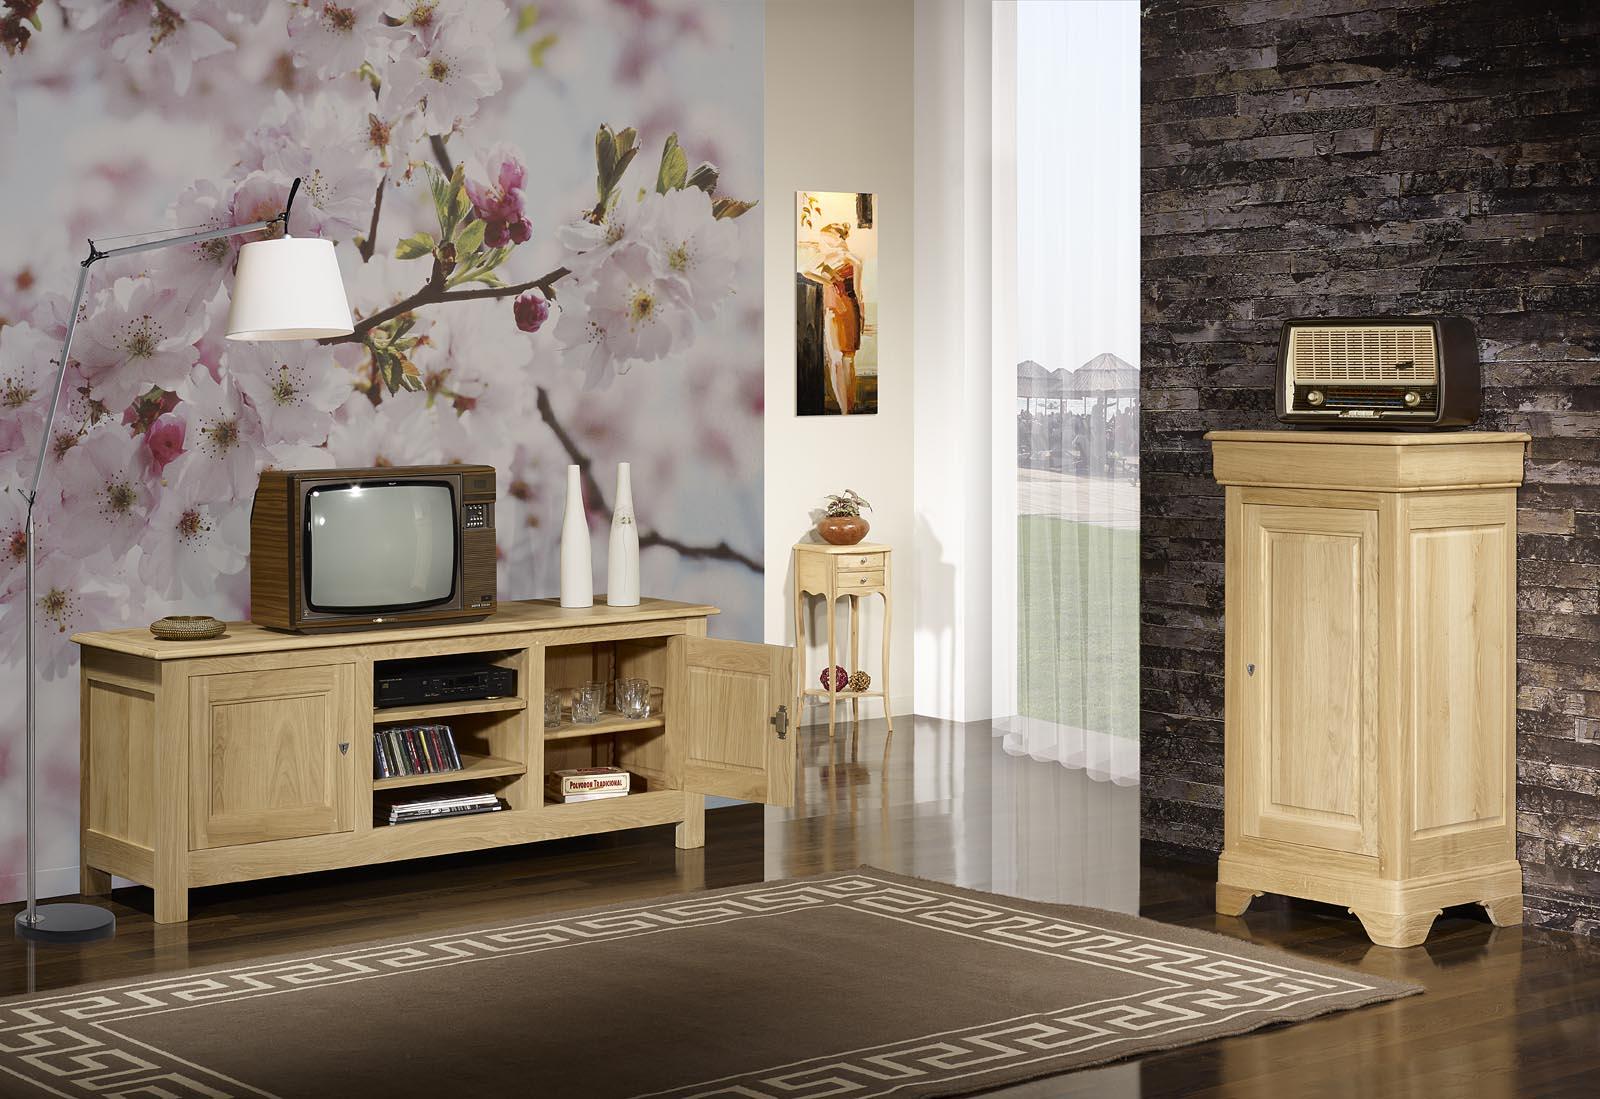 meuble tv 16 9eme en ch ne massif de style campagnard finition ch ne bross naturel meuble en. Black Bedroom Furniture Sets. Home Design Ideas